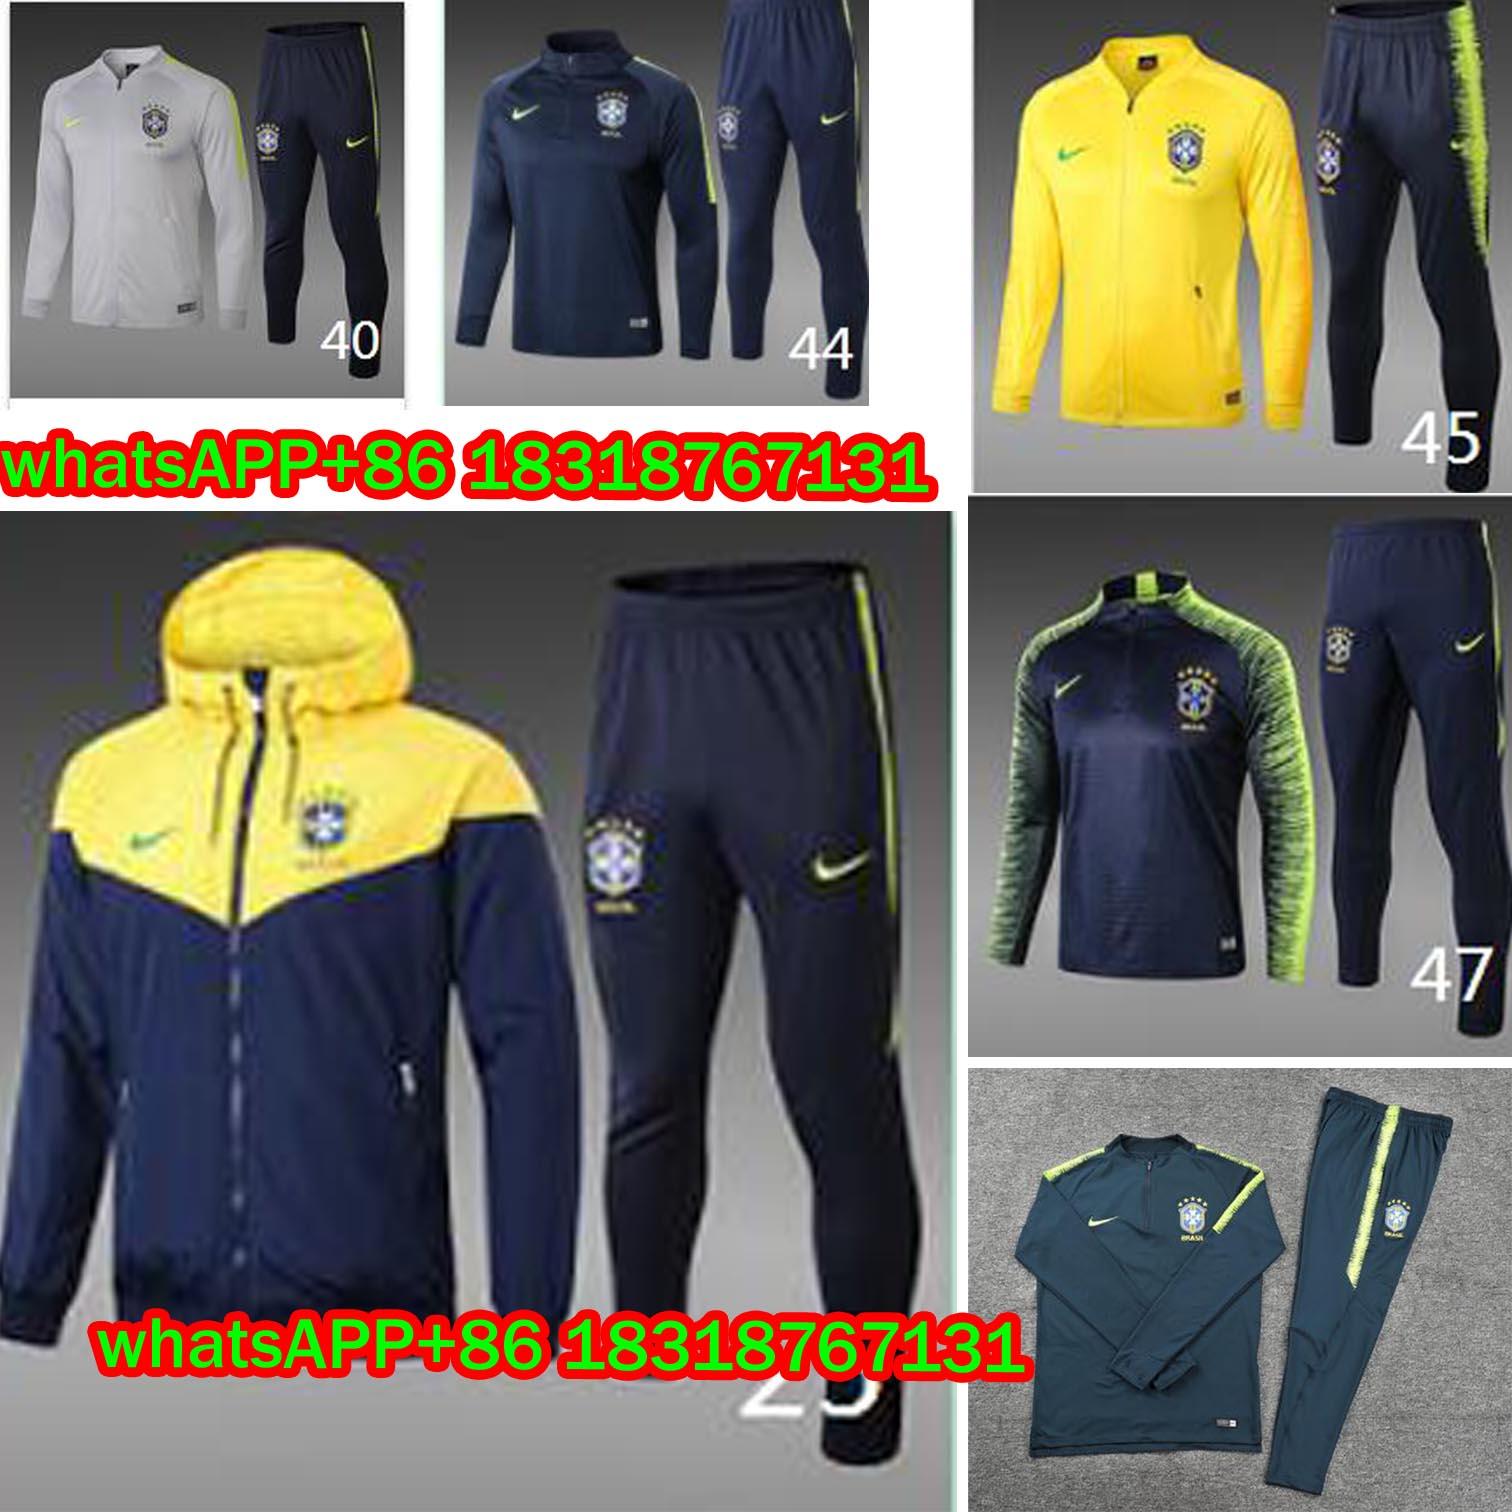 Coaching Put on 2018 2019 Brasil Shirt Set 18 19 Camisetas Camisa Survetement Homem Camisa Da Copa Do Mundo